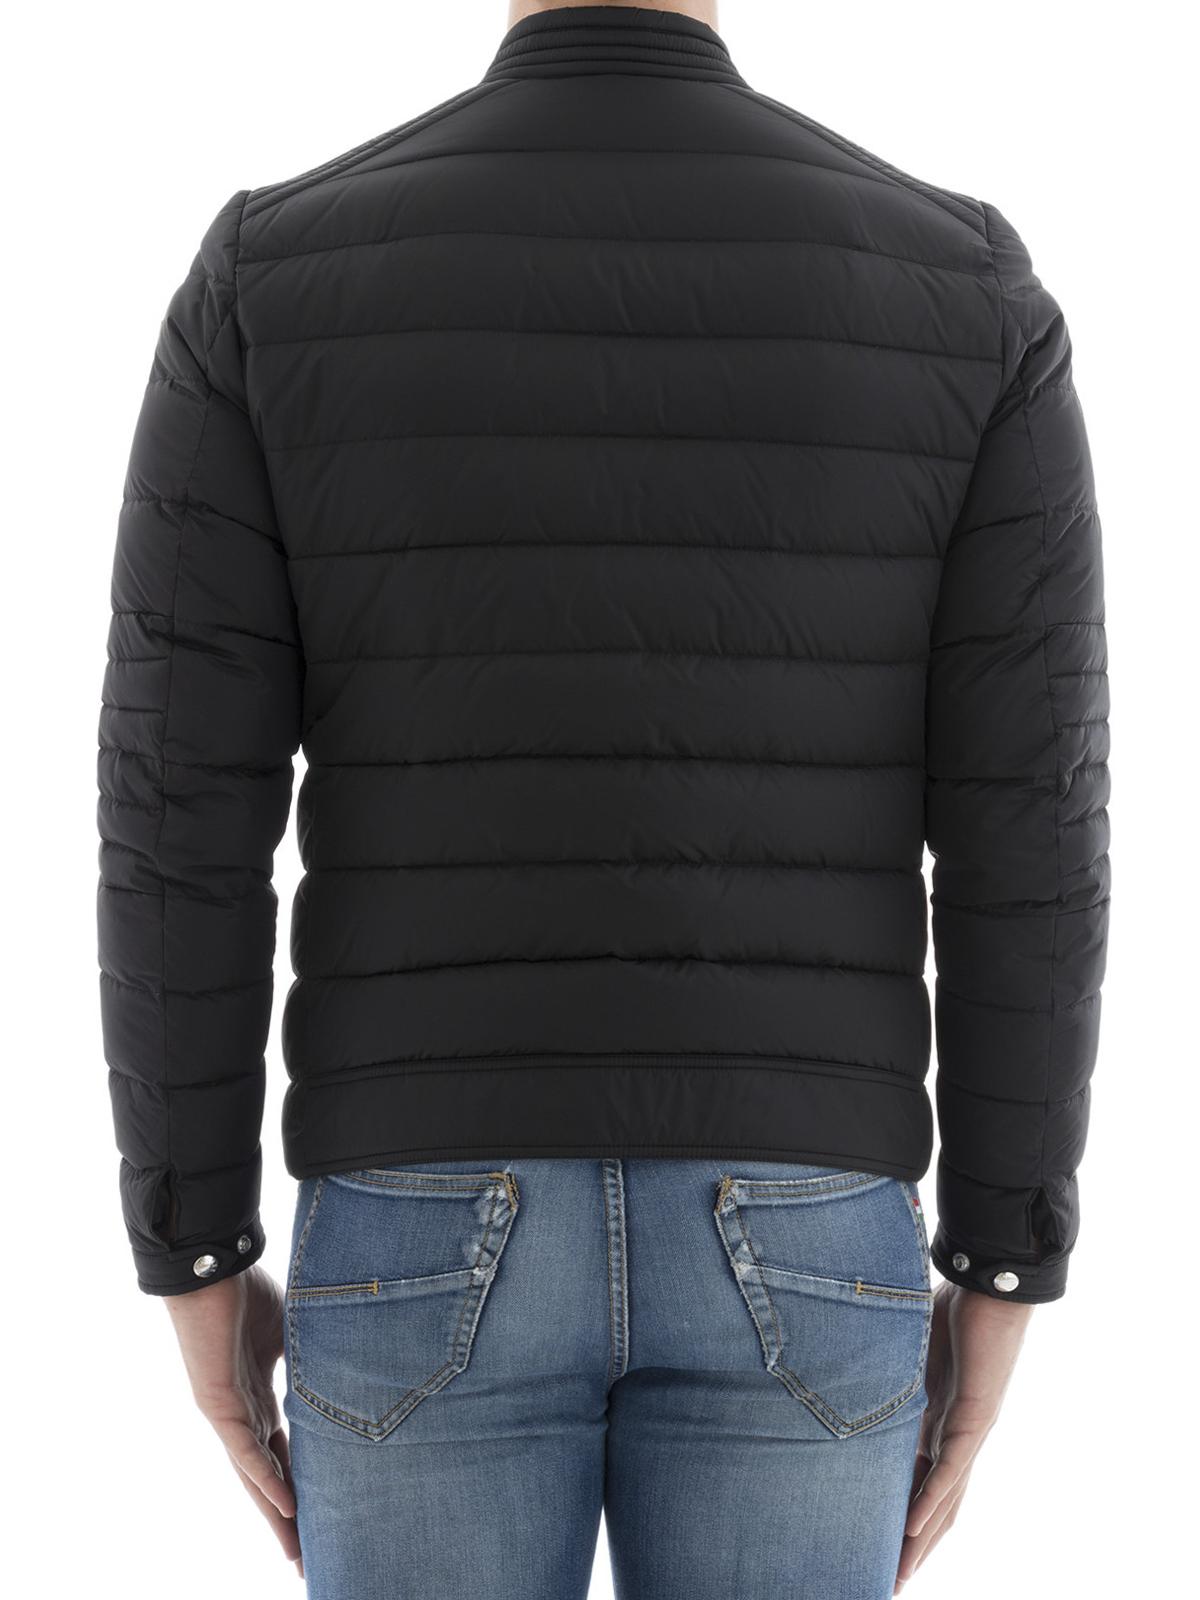 e203e4fe0 Moncler - Amiot quilted nylon biker jacket - biker jackets - 1 ...